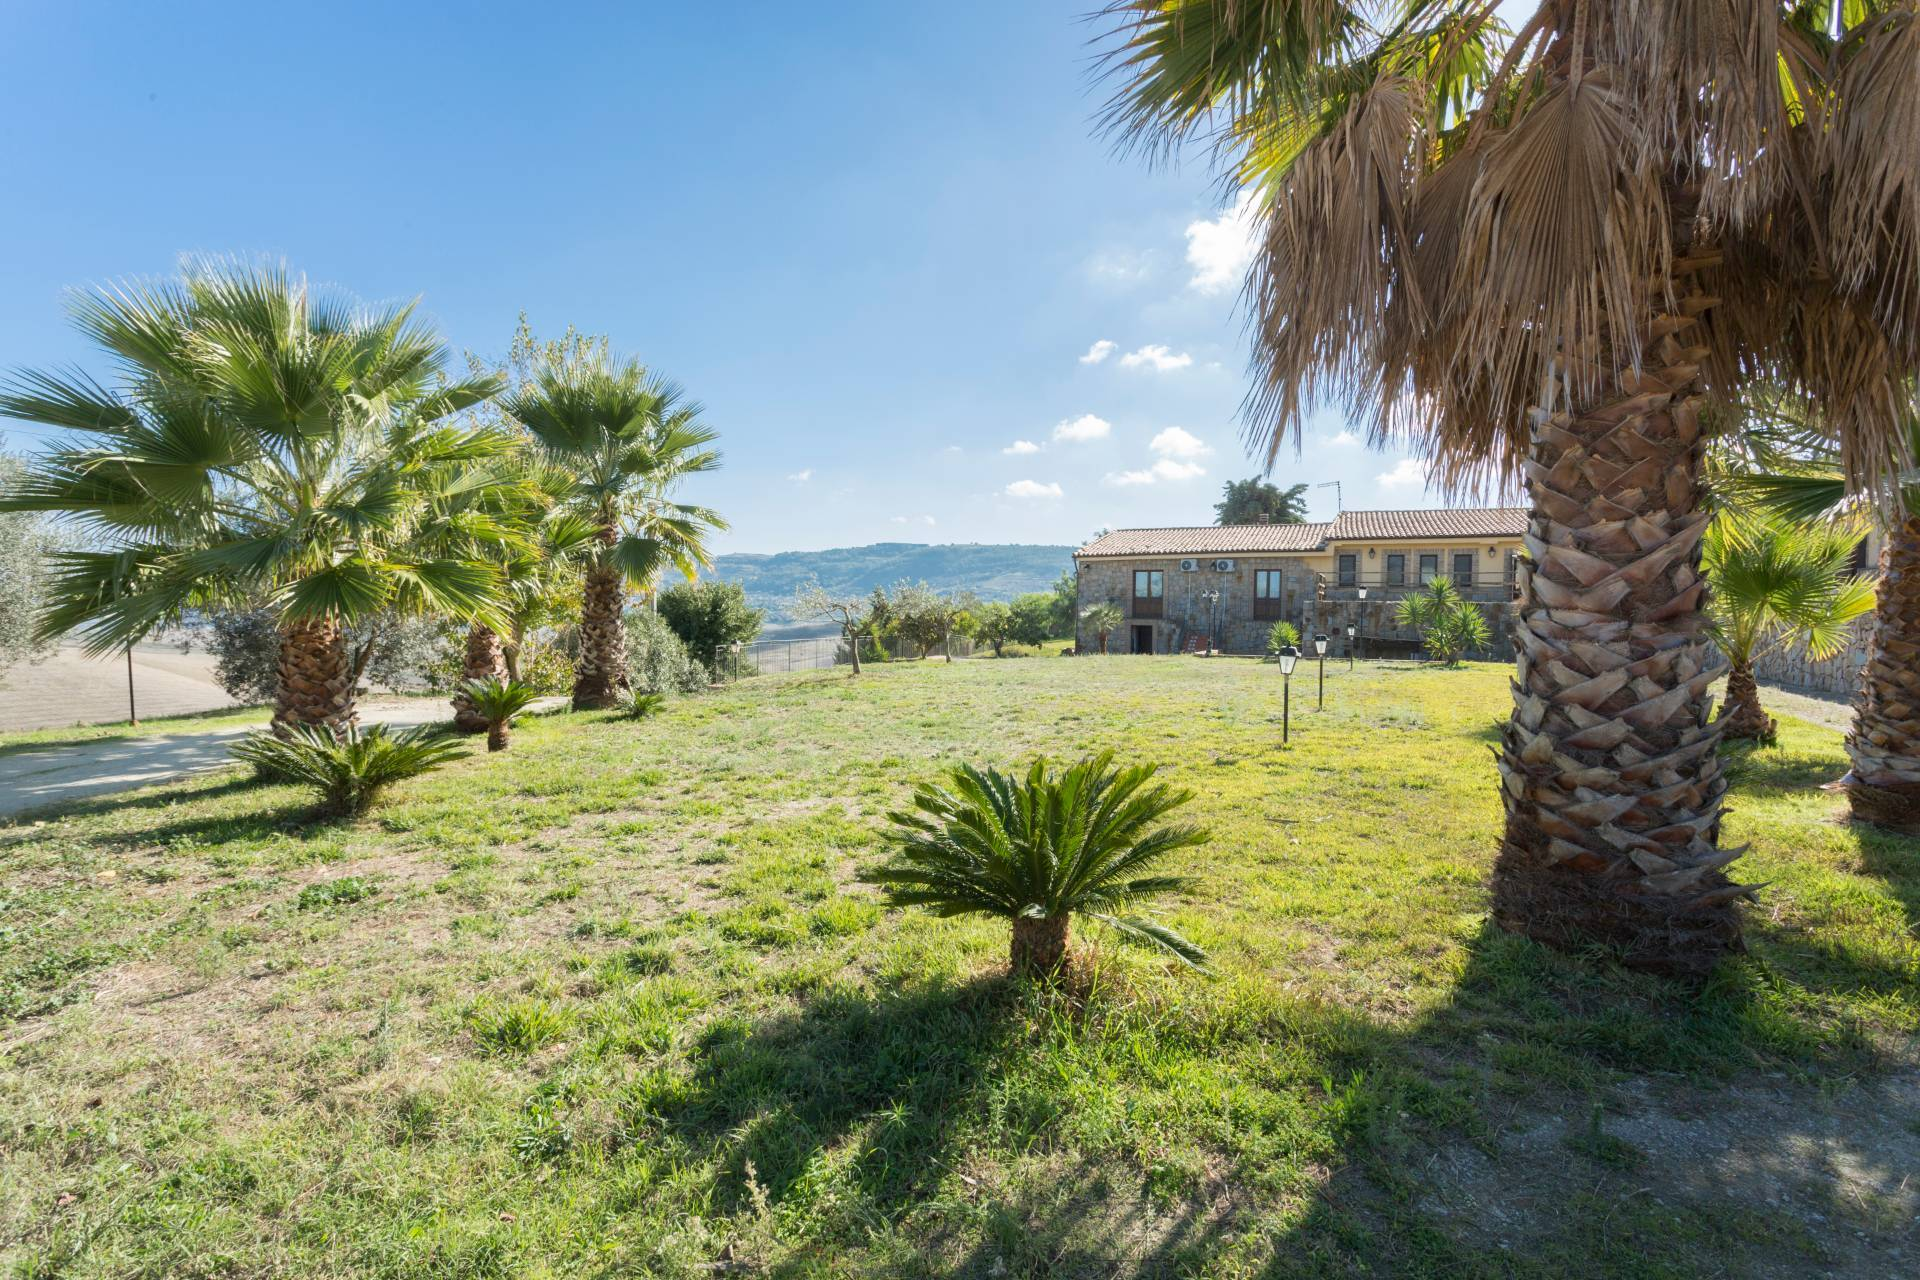 Villa in Vendita a Piazza Armerina: 5 locali, 550 mq - Foto 9